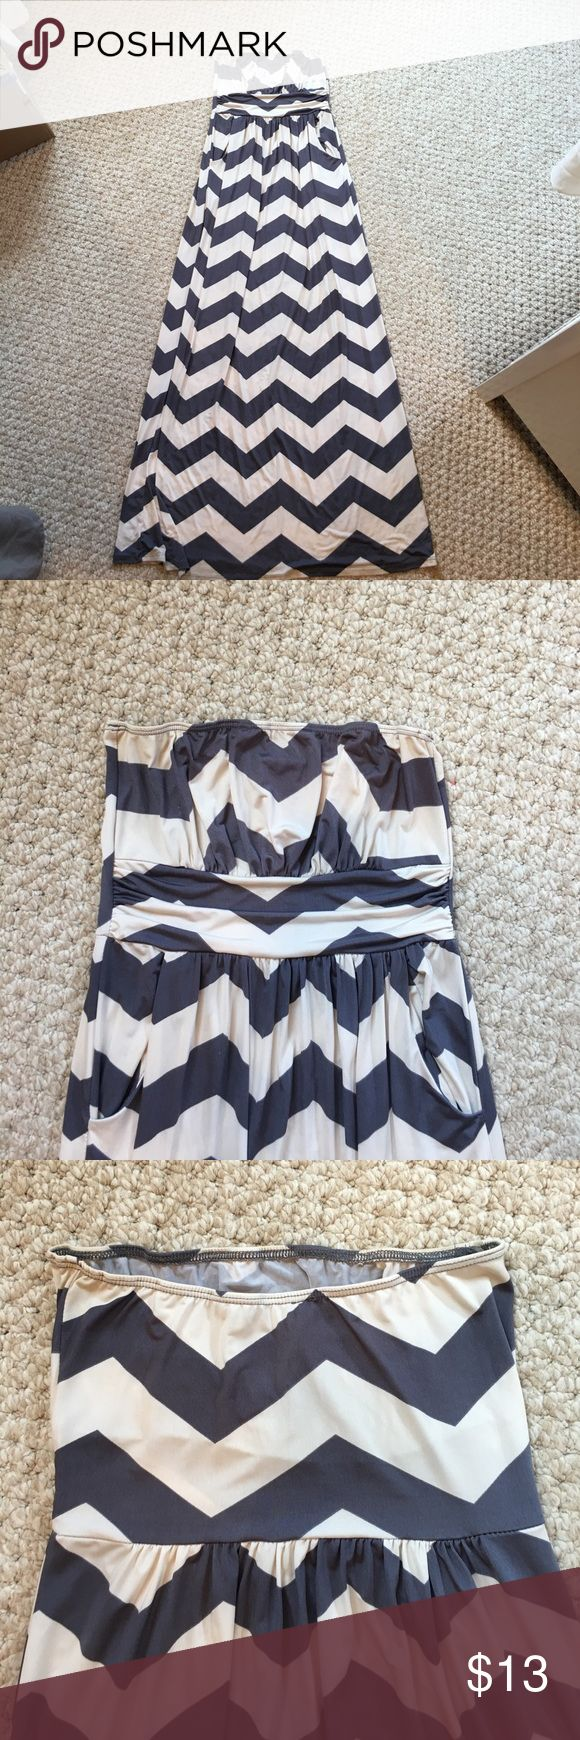 Chevron Maxi Dress Satin chevron maxi dress - fitted and sliming - has pockets Dresses Maxi